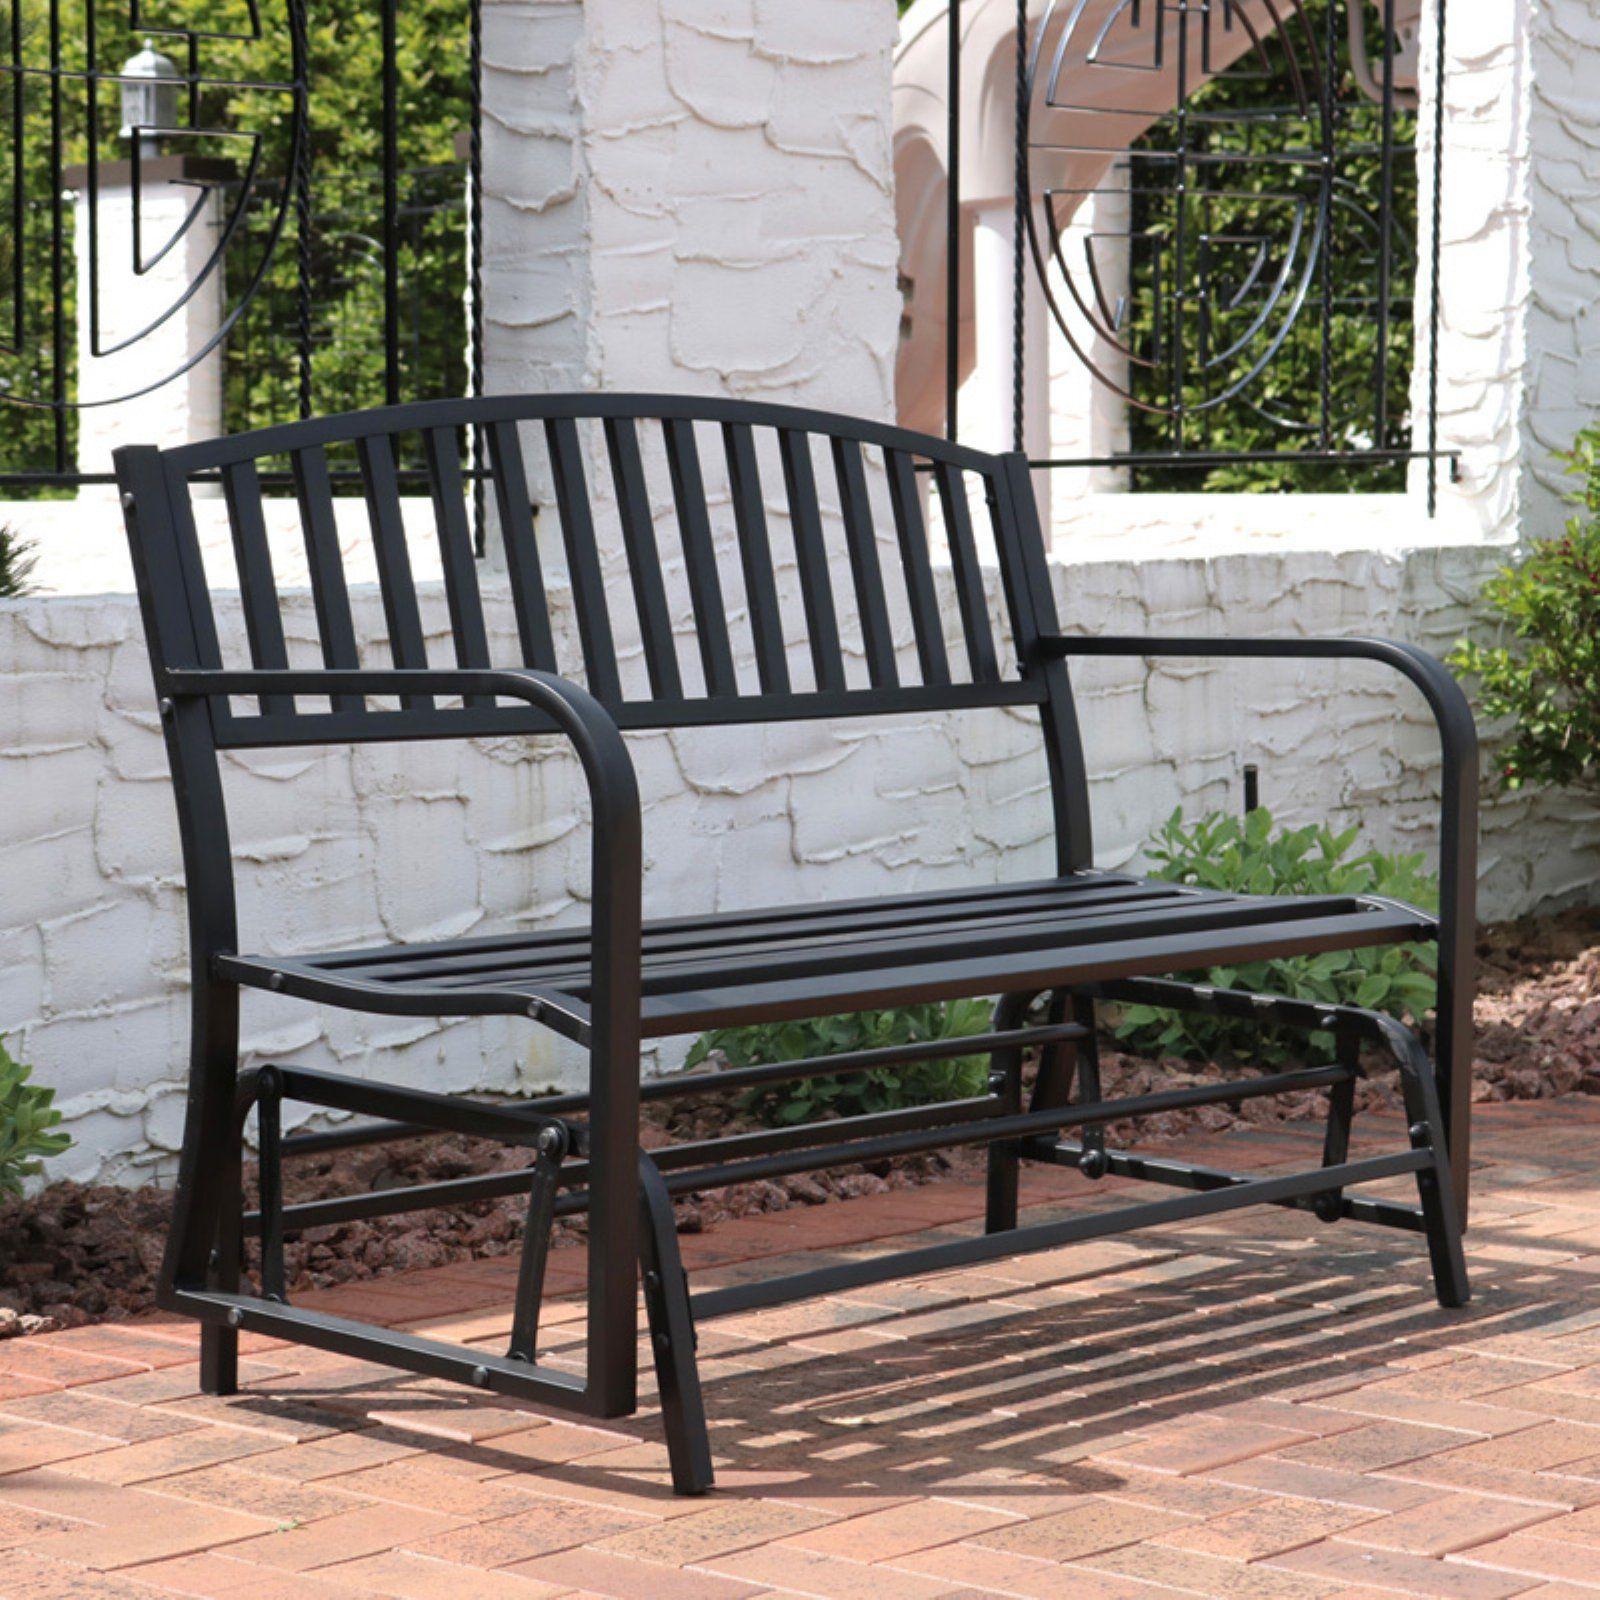 Astounding Sunnydaze Decor 4 Ft Steel Outdoor Glider Bench Black Machost Co Dining Chair Design Ideas Machostcouk